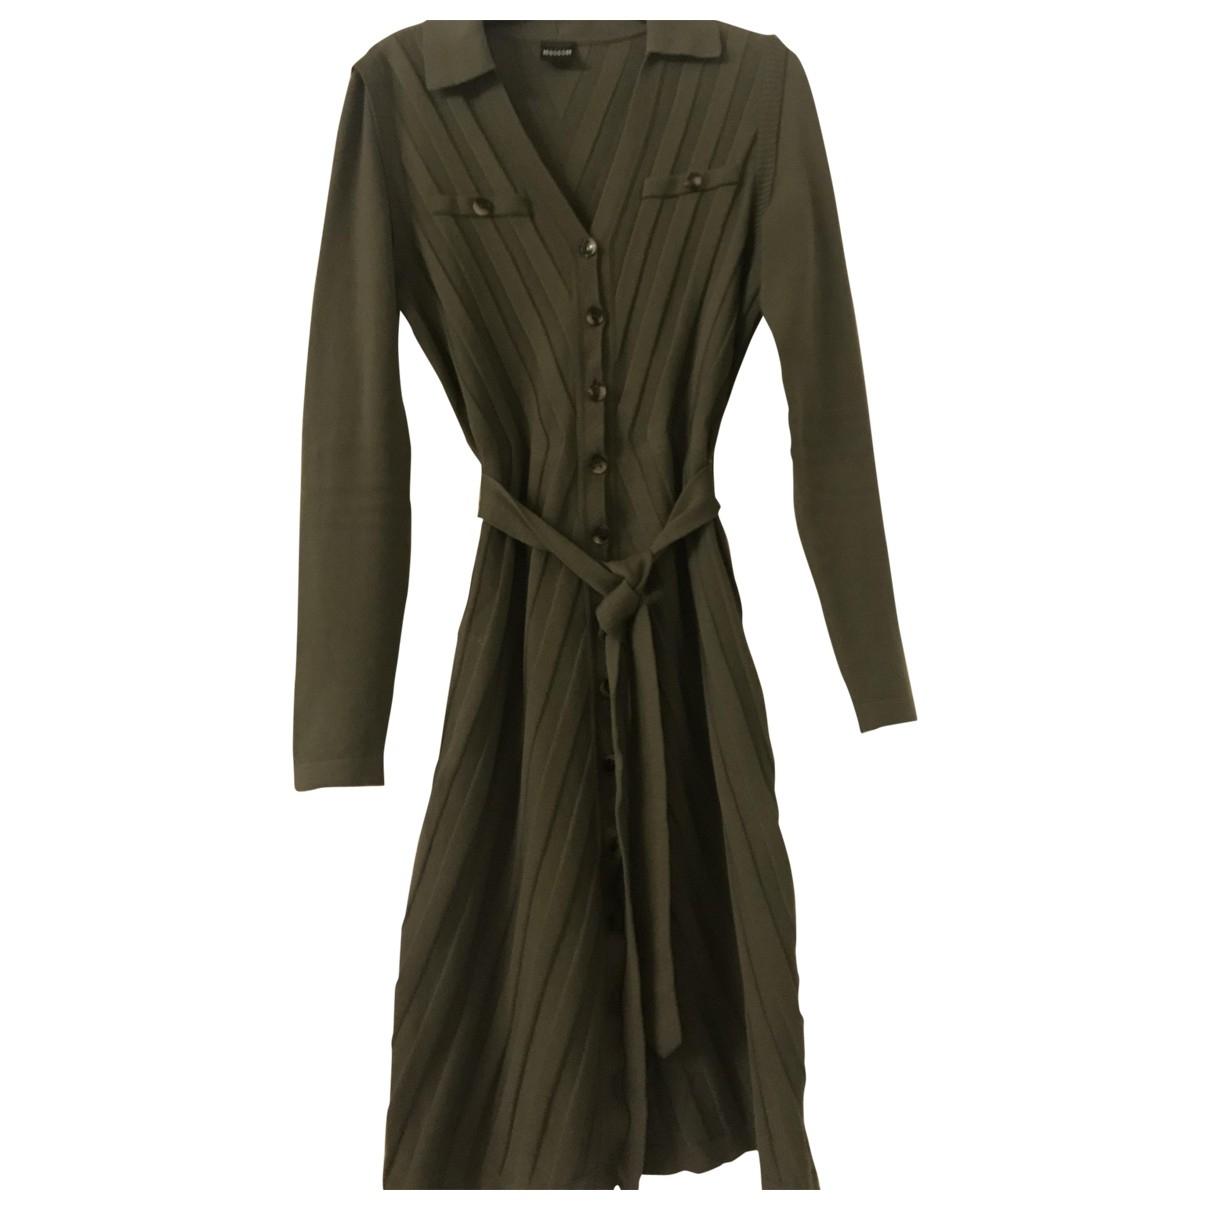 Wolford \N Khaki Wool dress for Women XS International